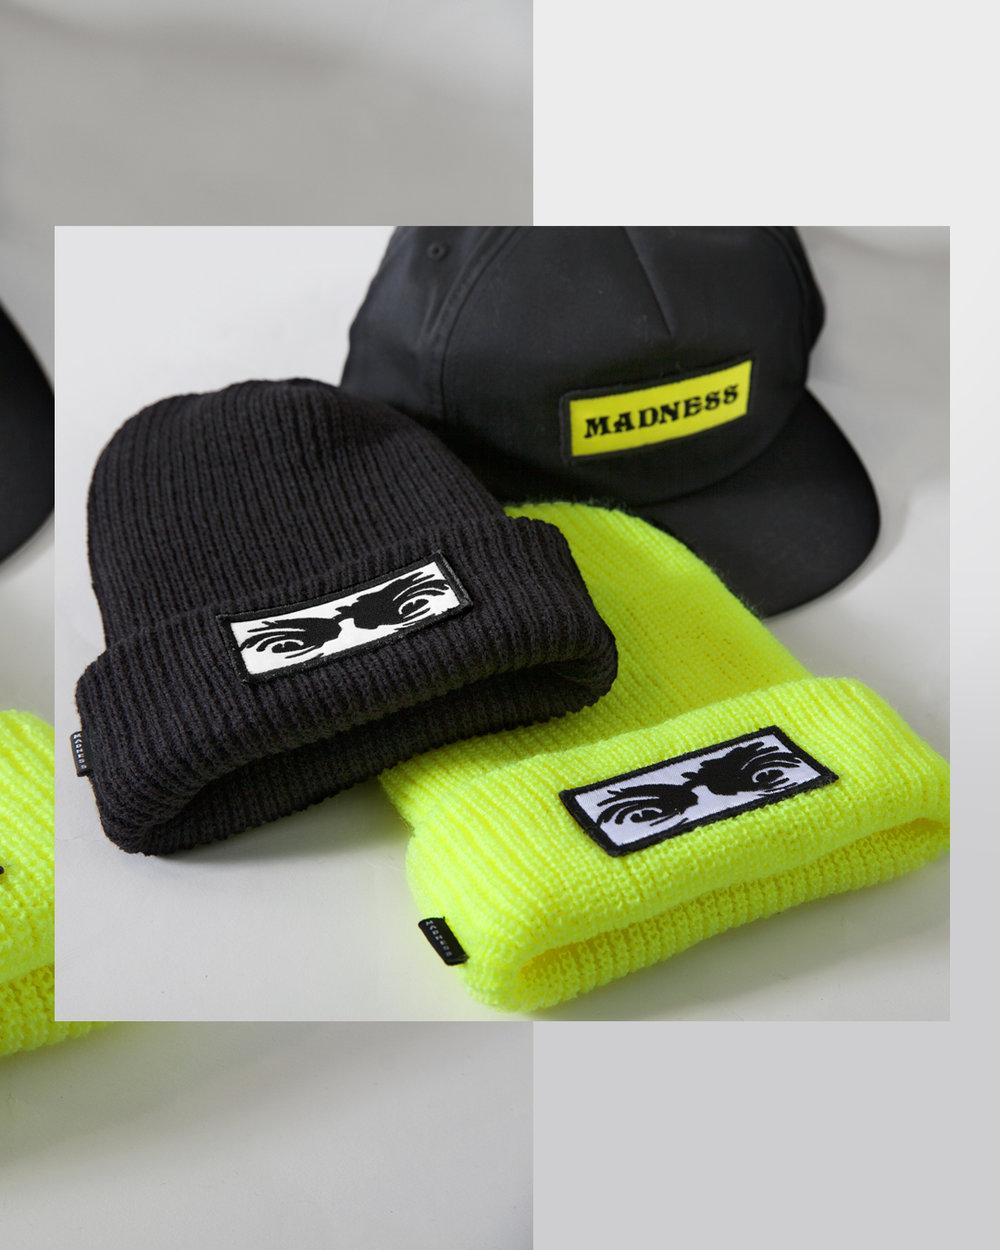 Madness-skateboards-Apparel-1350-Head-2.jpg